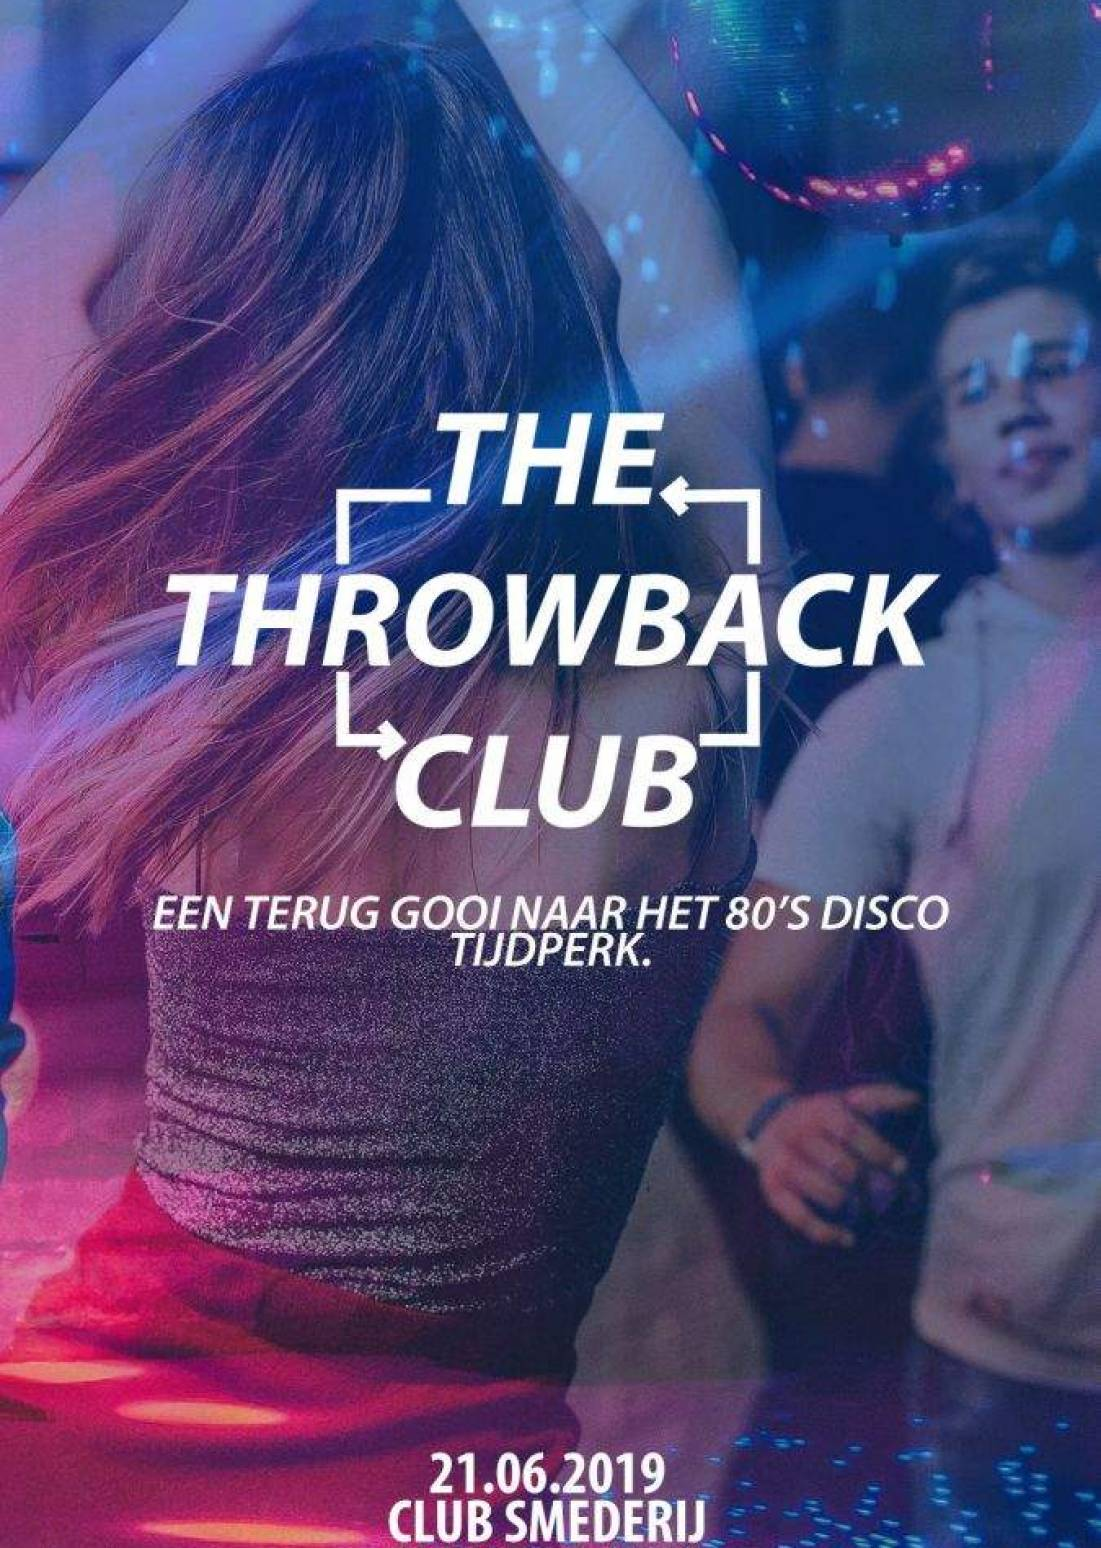 The Throwback Club